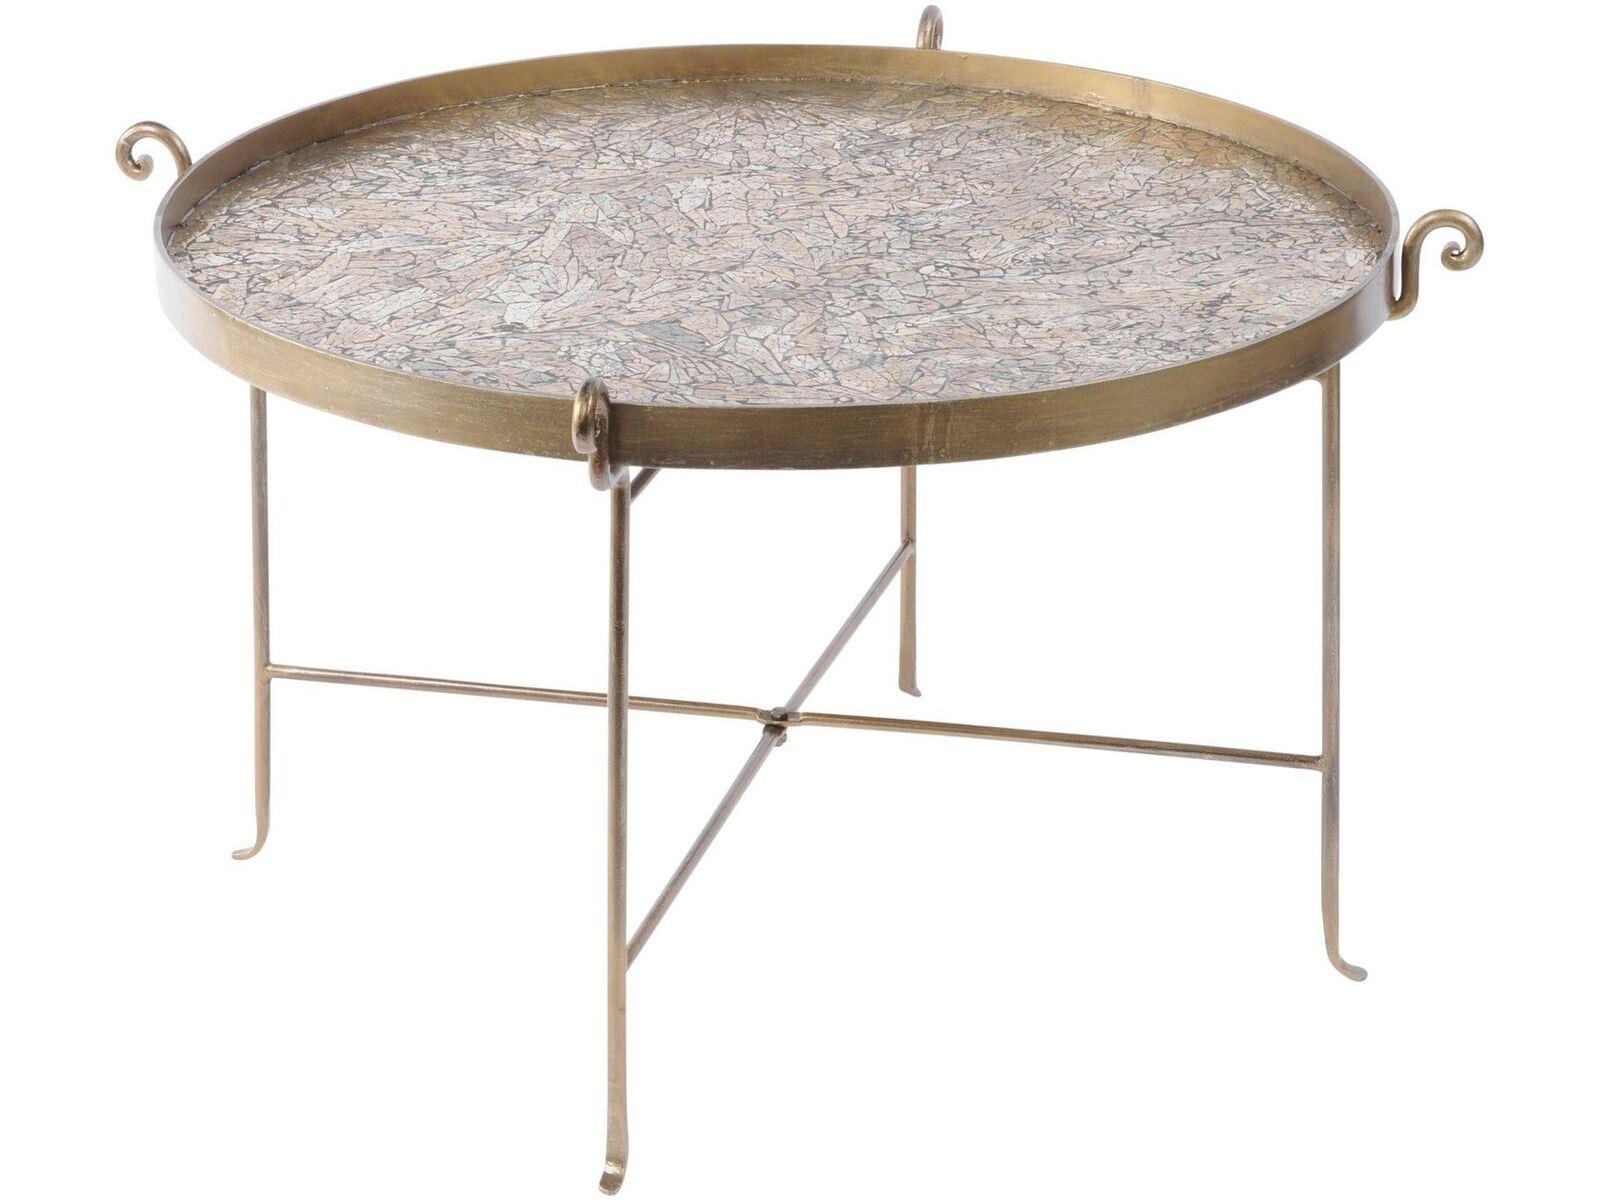 Libra Metallique Mosaique En Metal Table Basse Ronde Fer Bronze Ebay